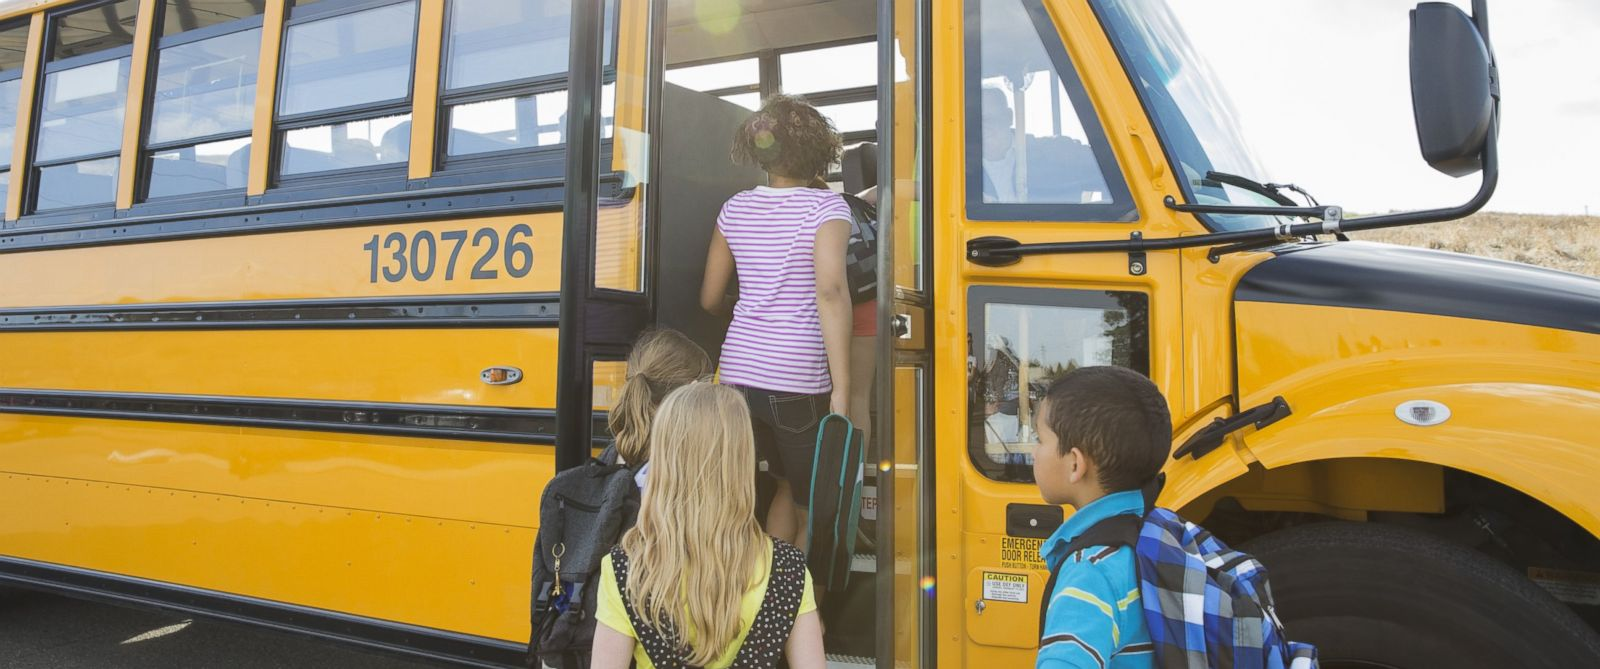 PHOTO: Children board a school bus in an undated stock photo.